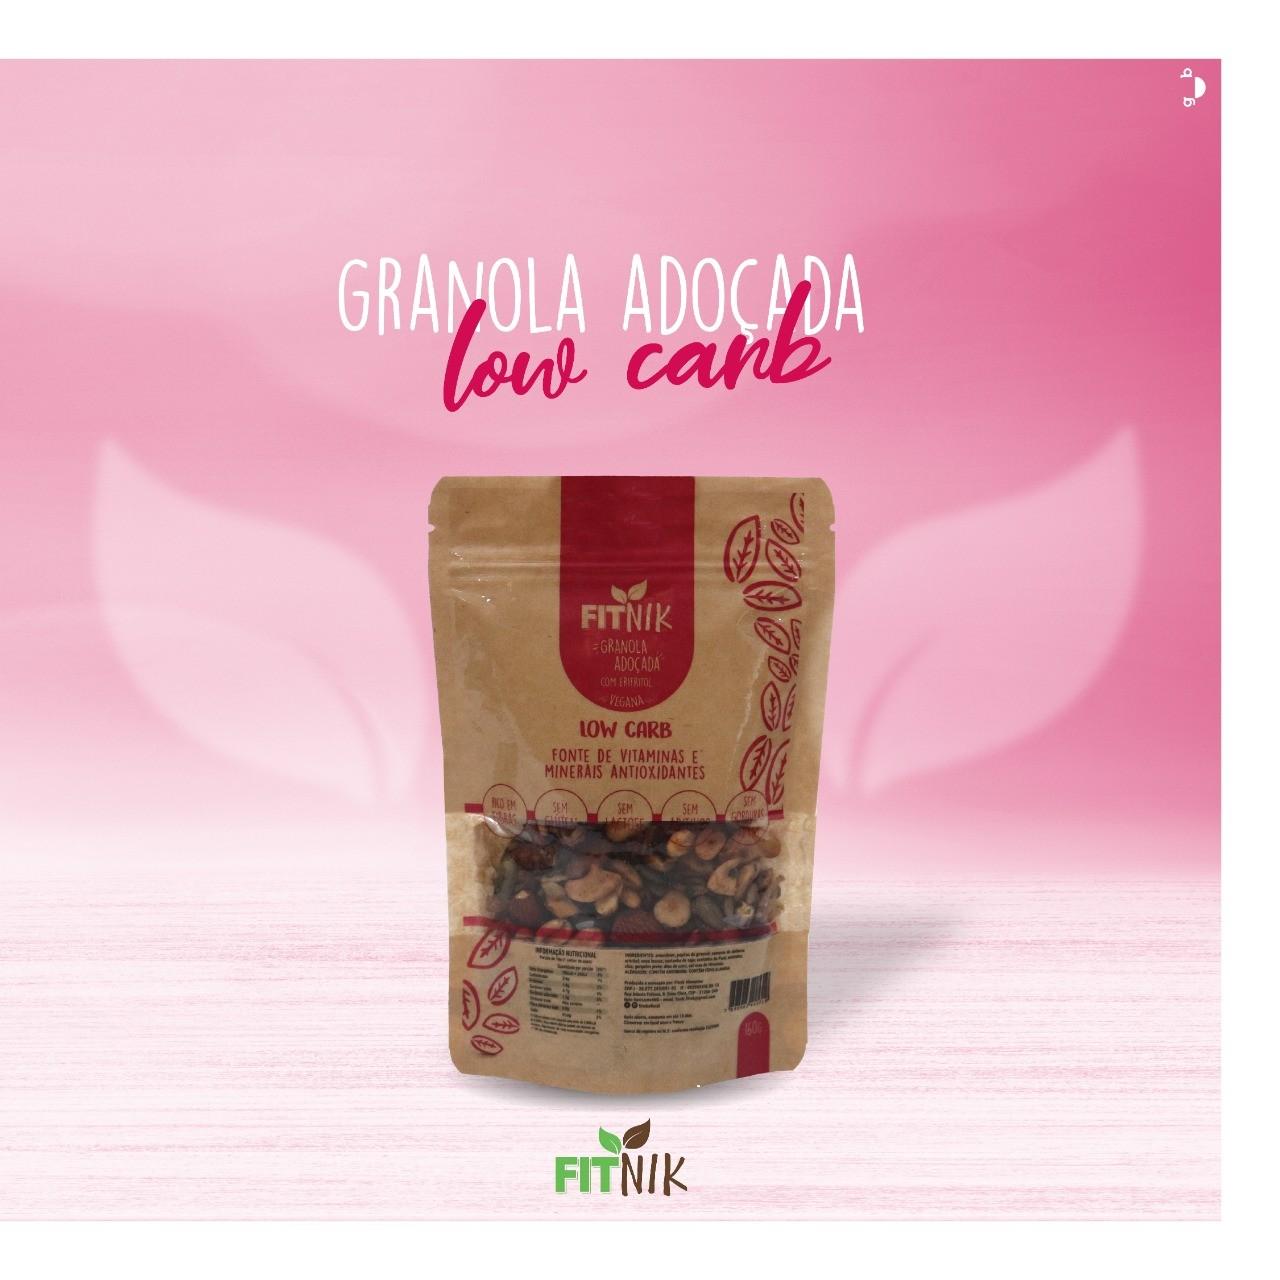 Granola Low Carb adoçada com eritritol 160g - FitNik